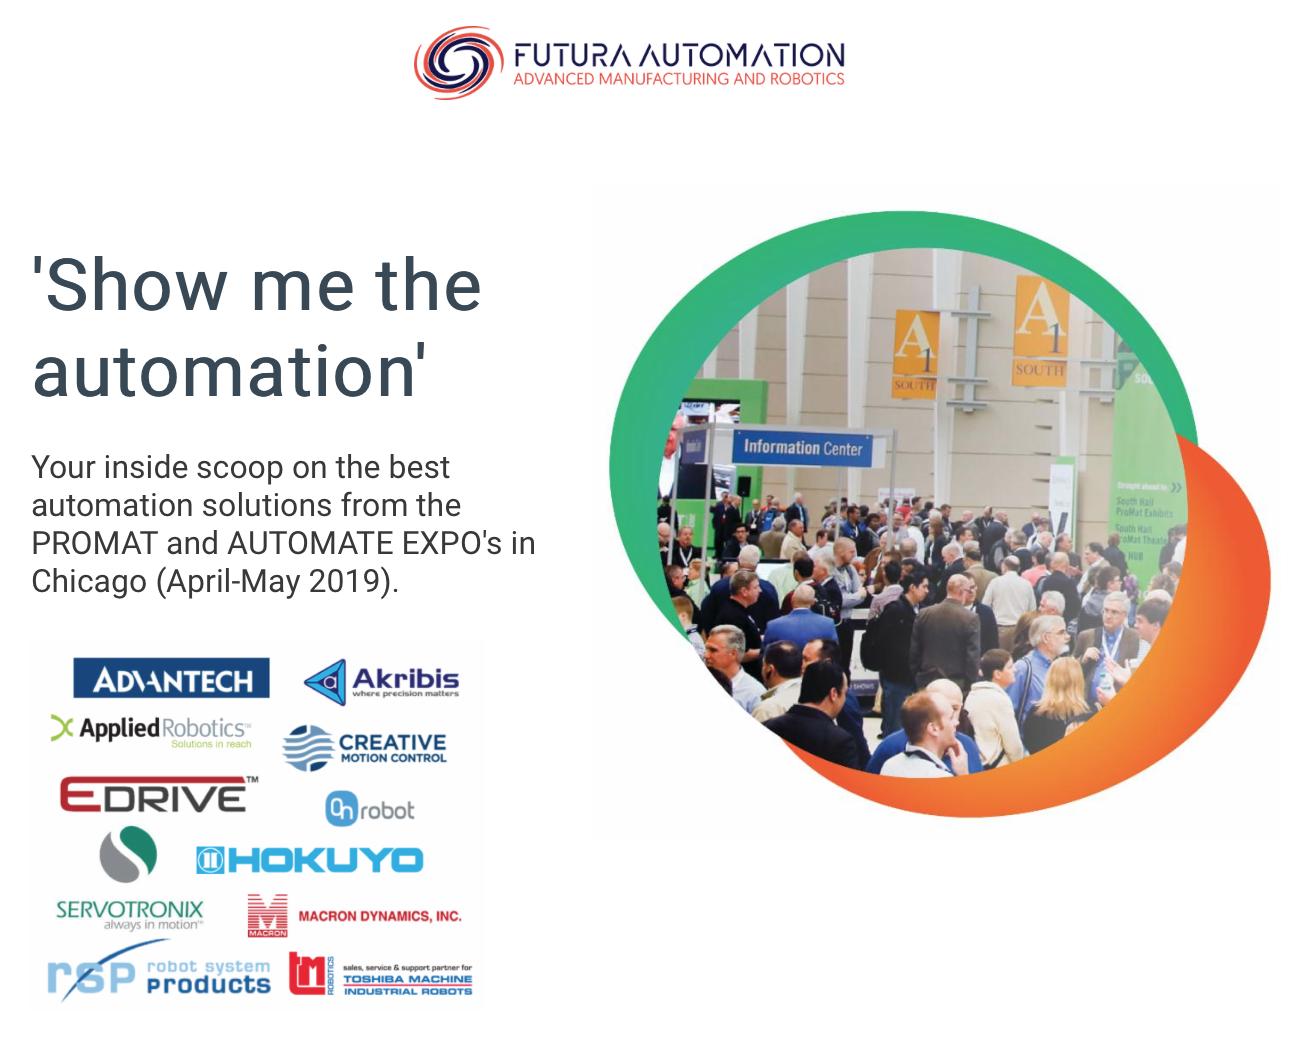 Futura Automation Promat and more